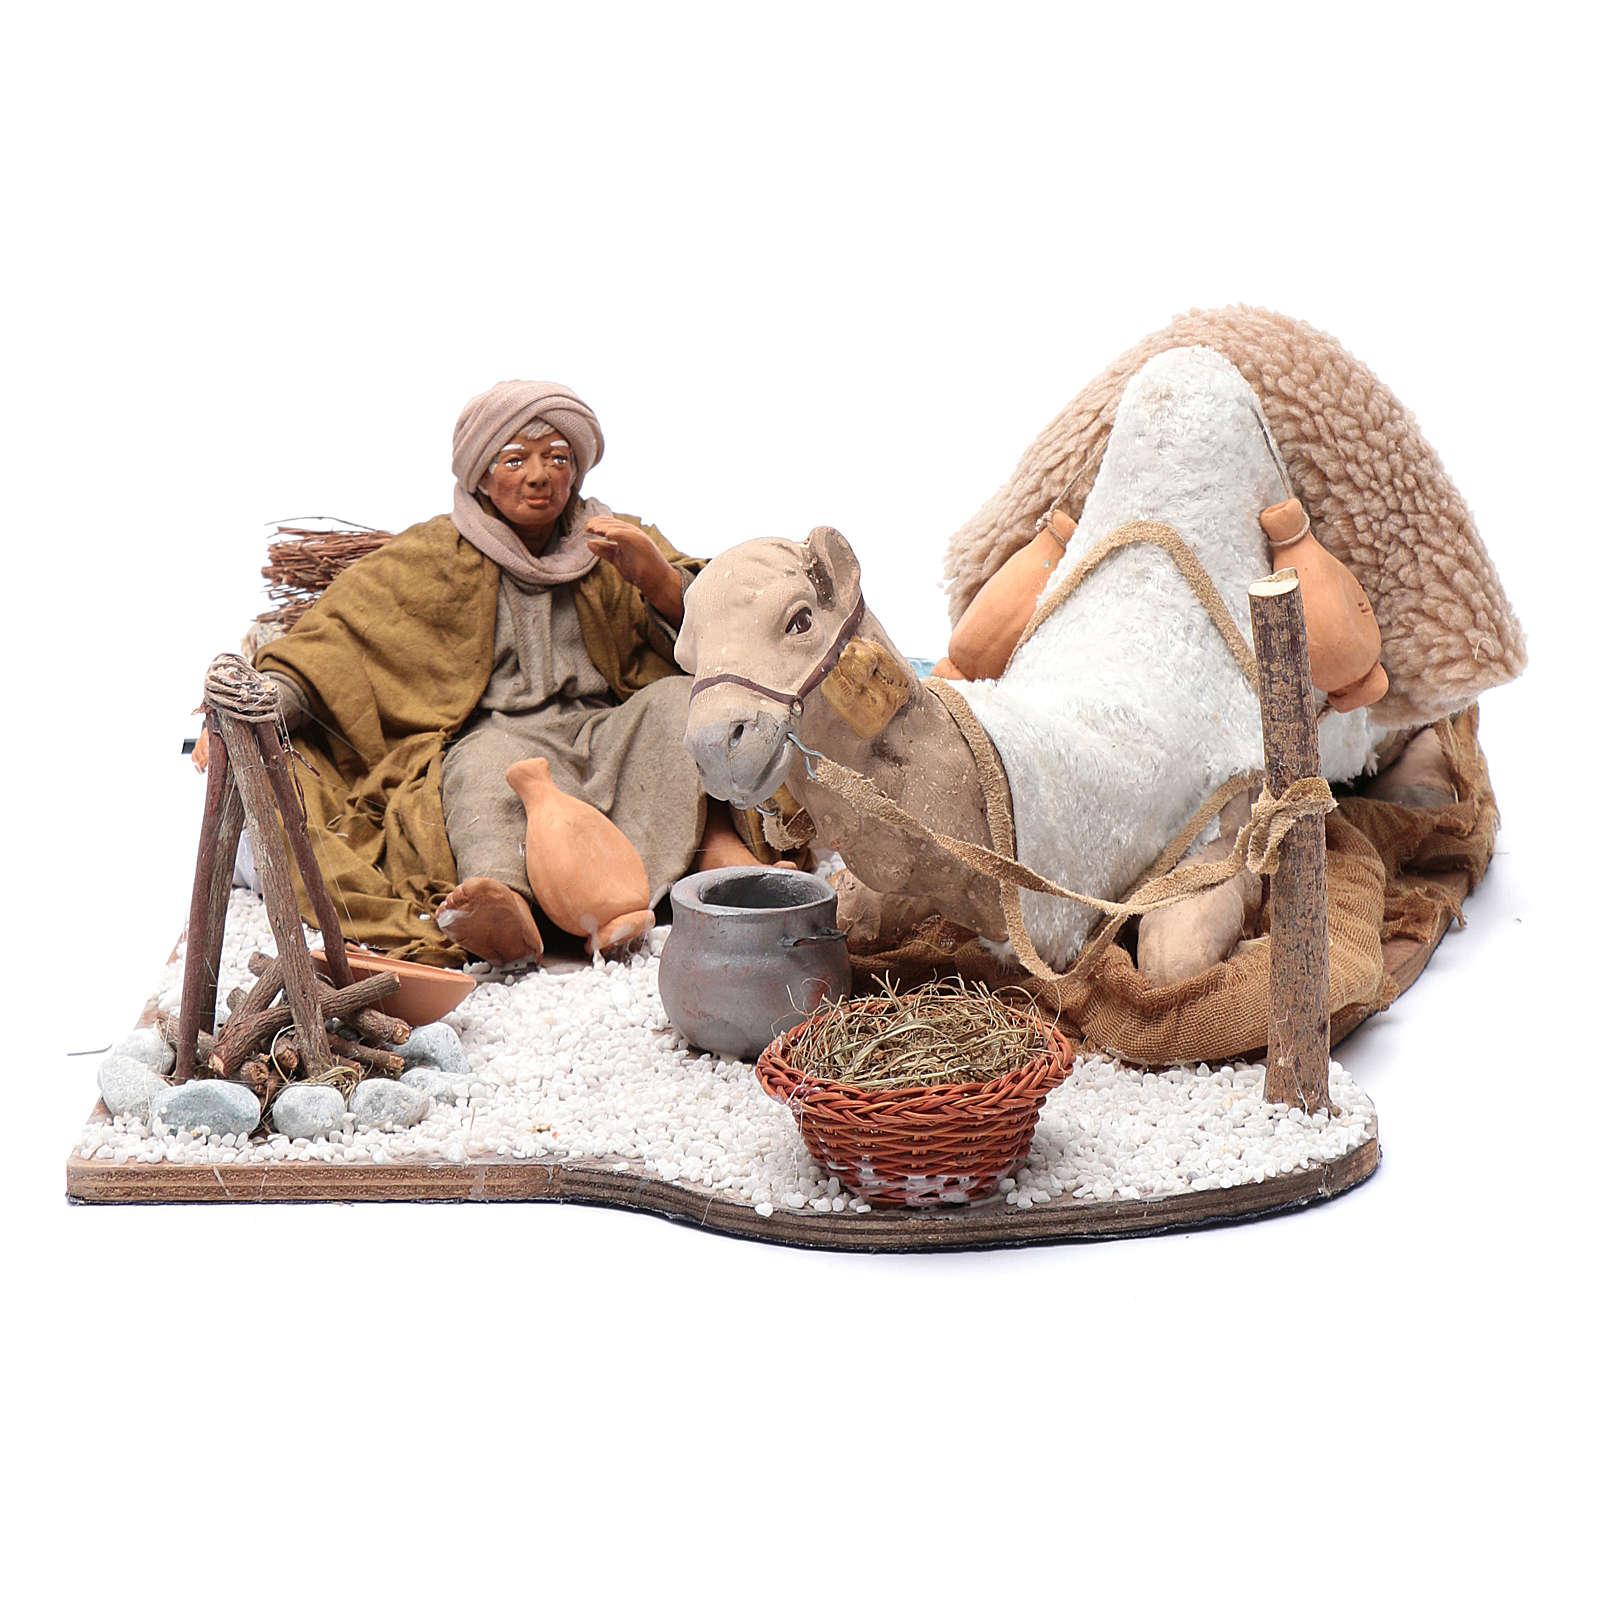 Camel driver and camel  in movement 24 cm for Neapolitan nativity scene 4